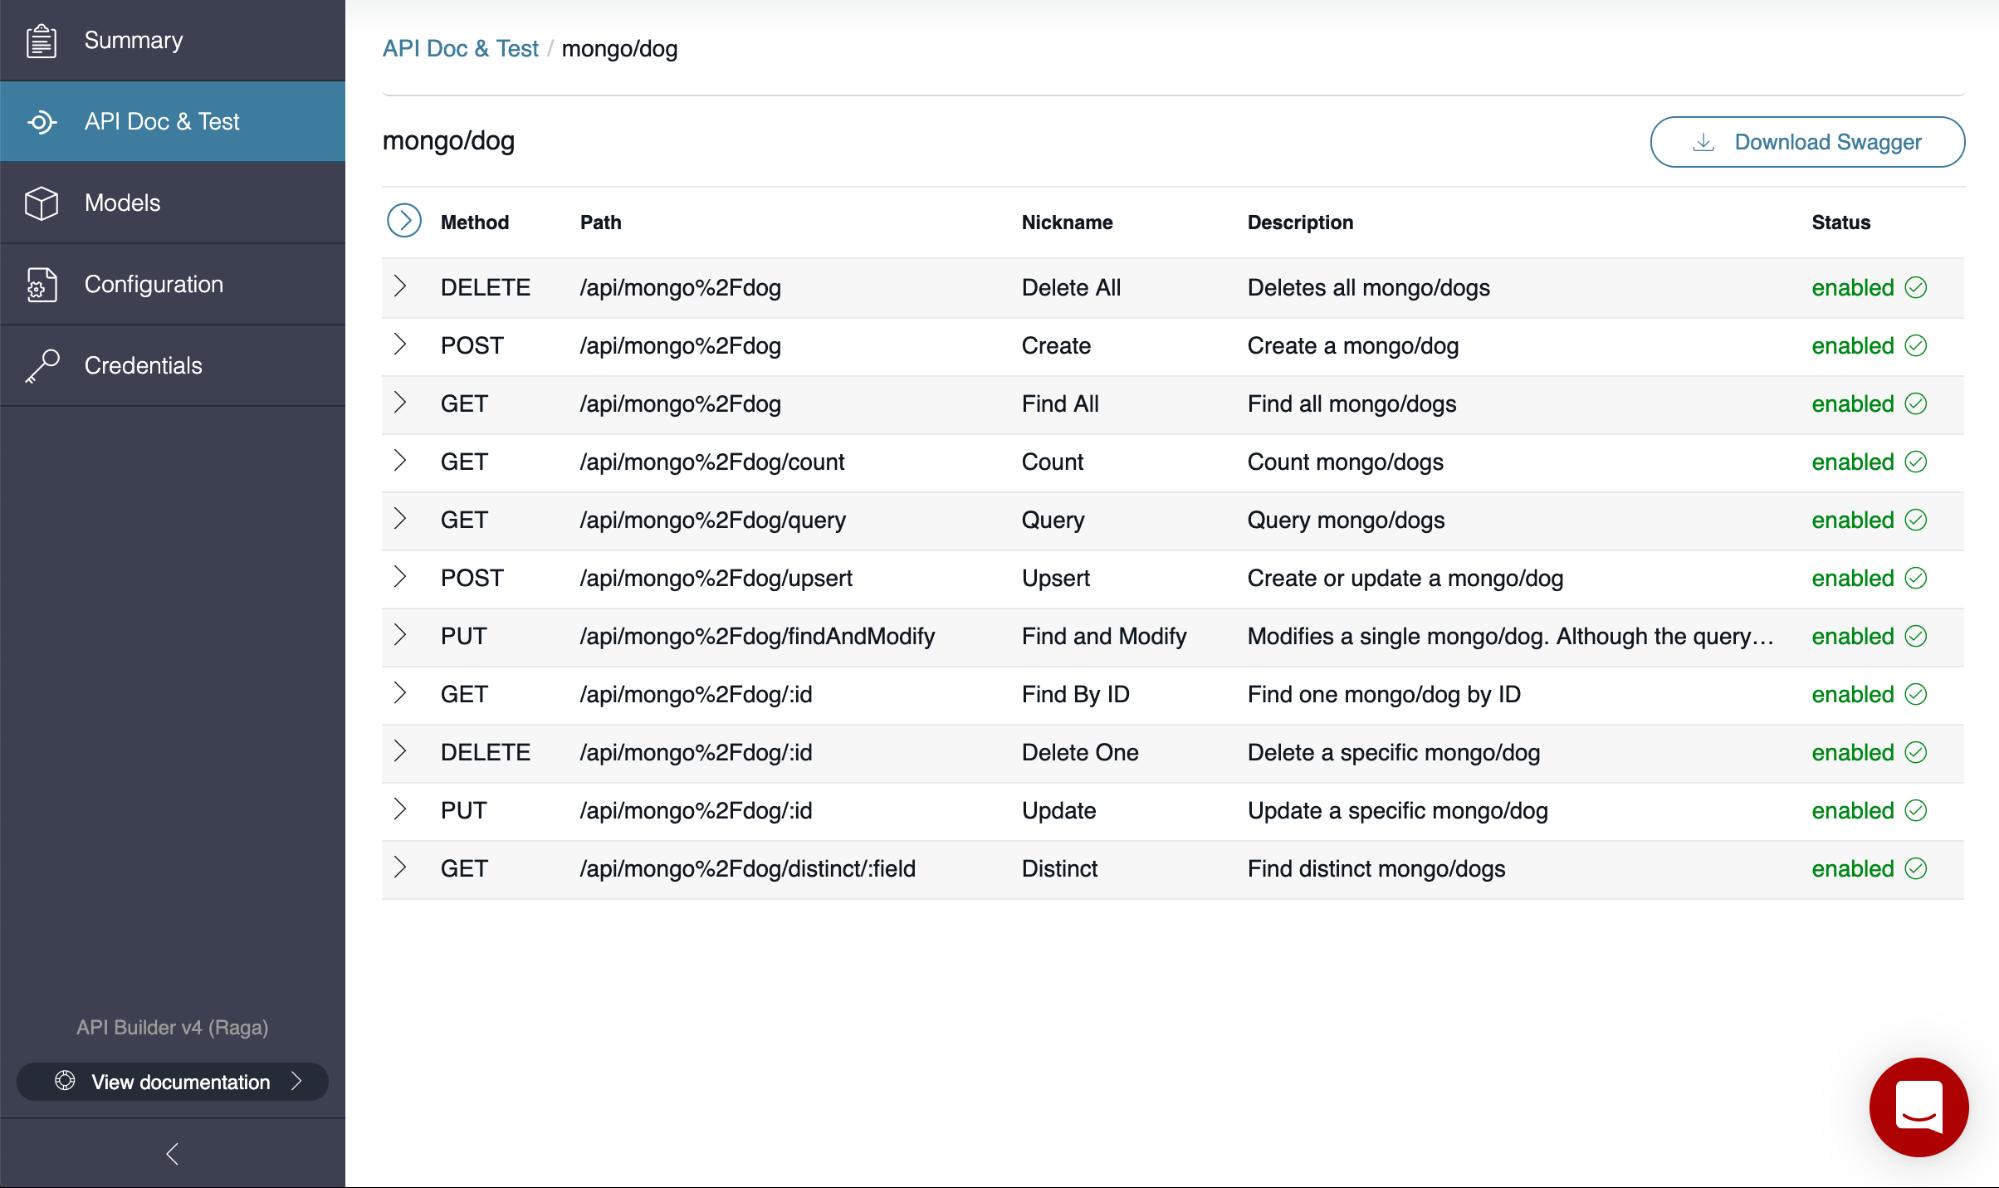 See the full set of CRUD APIs